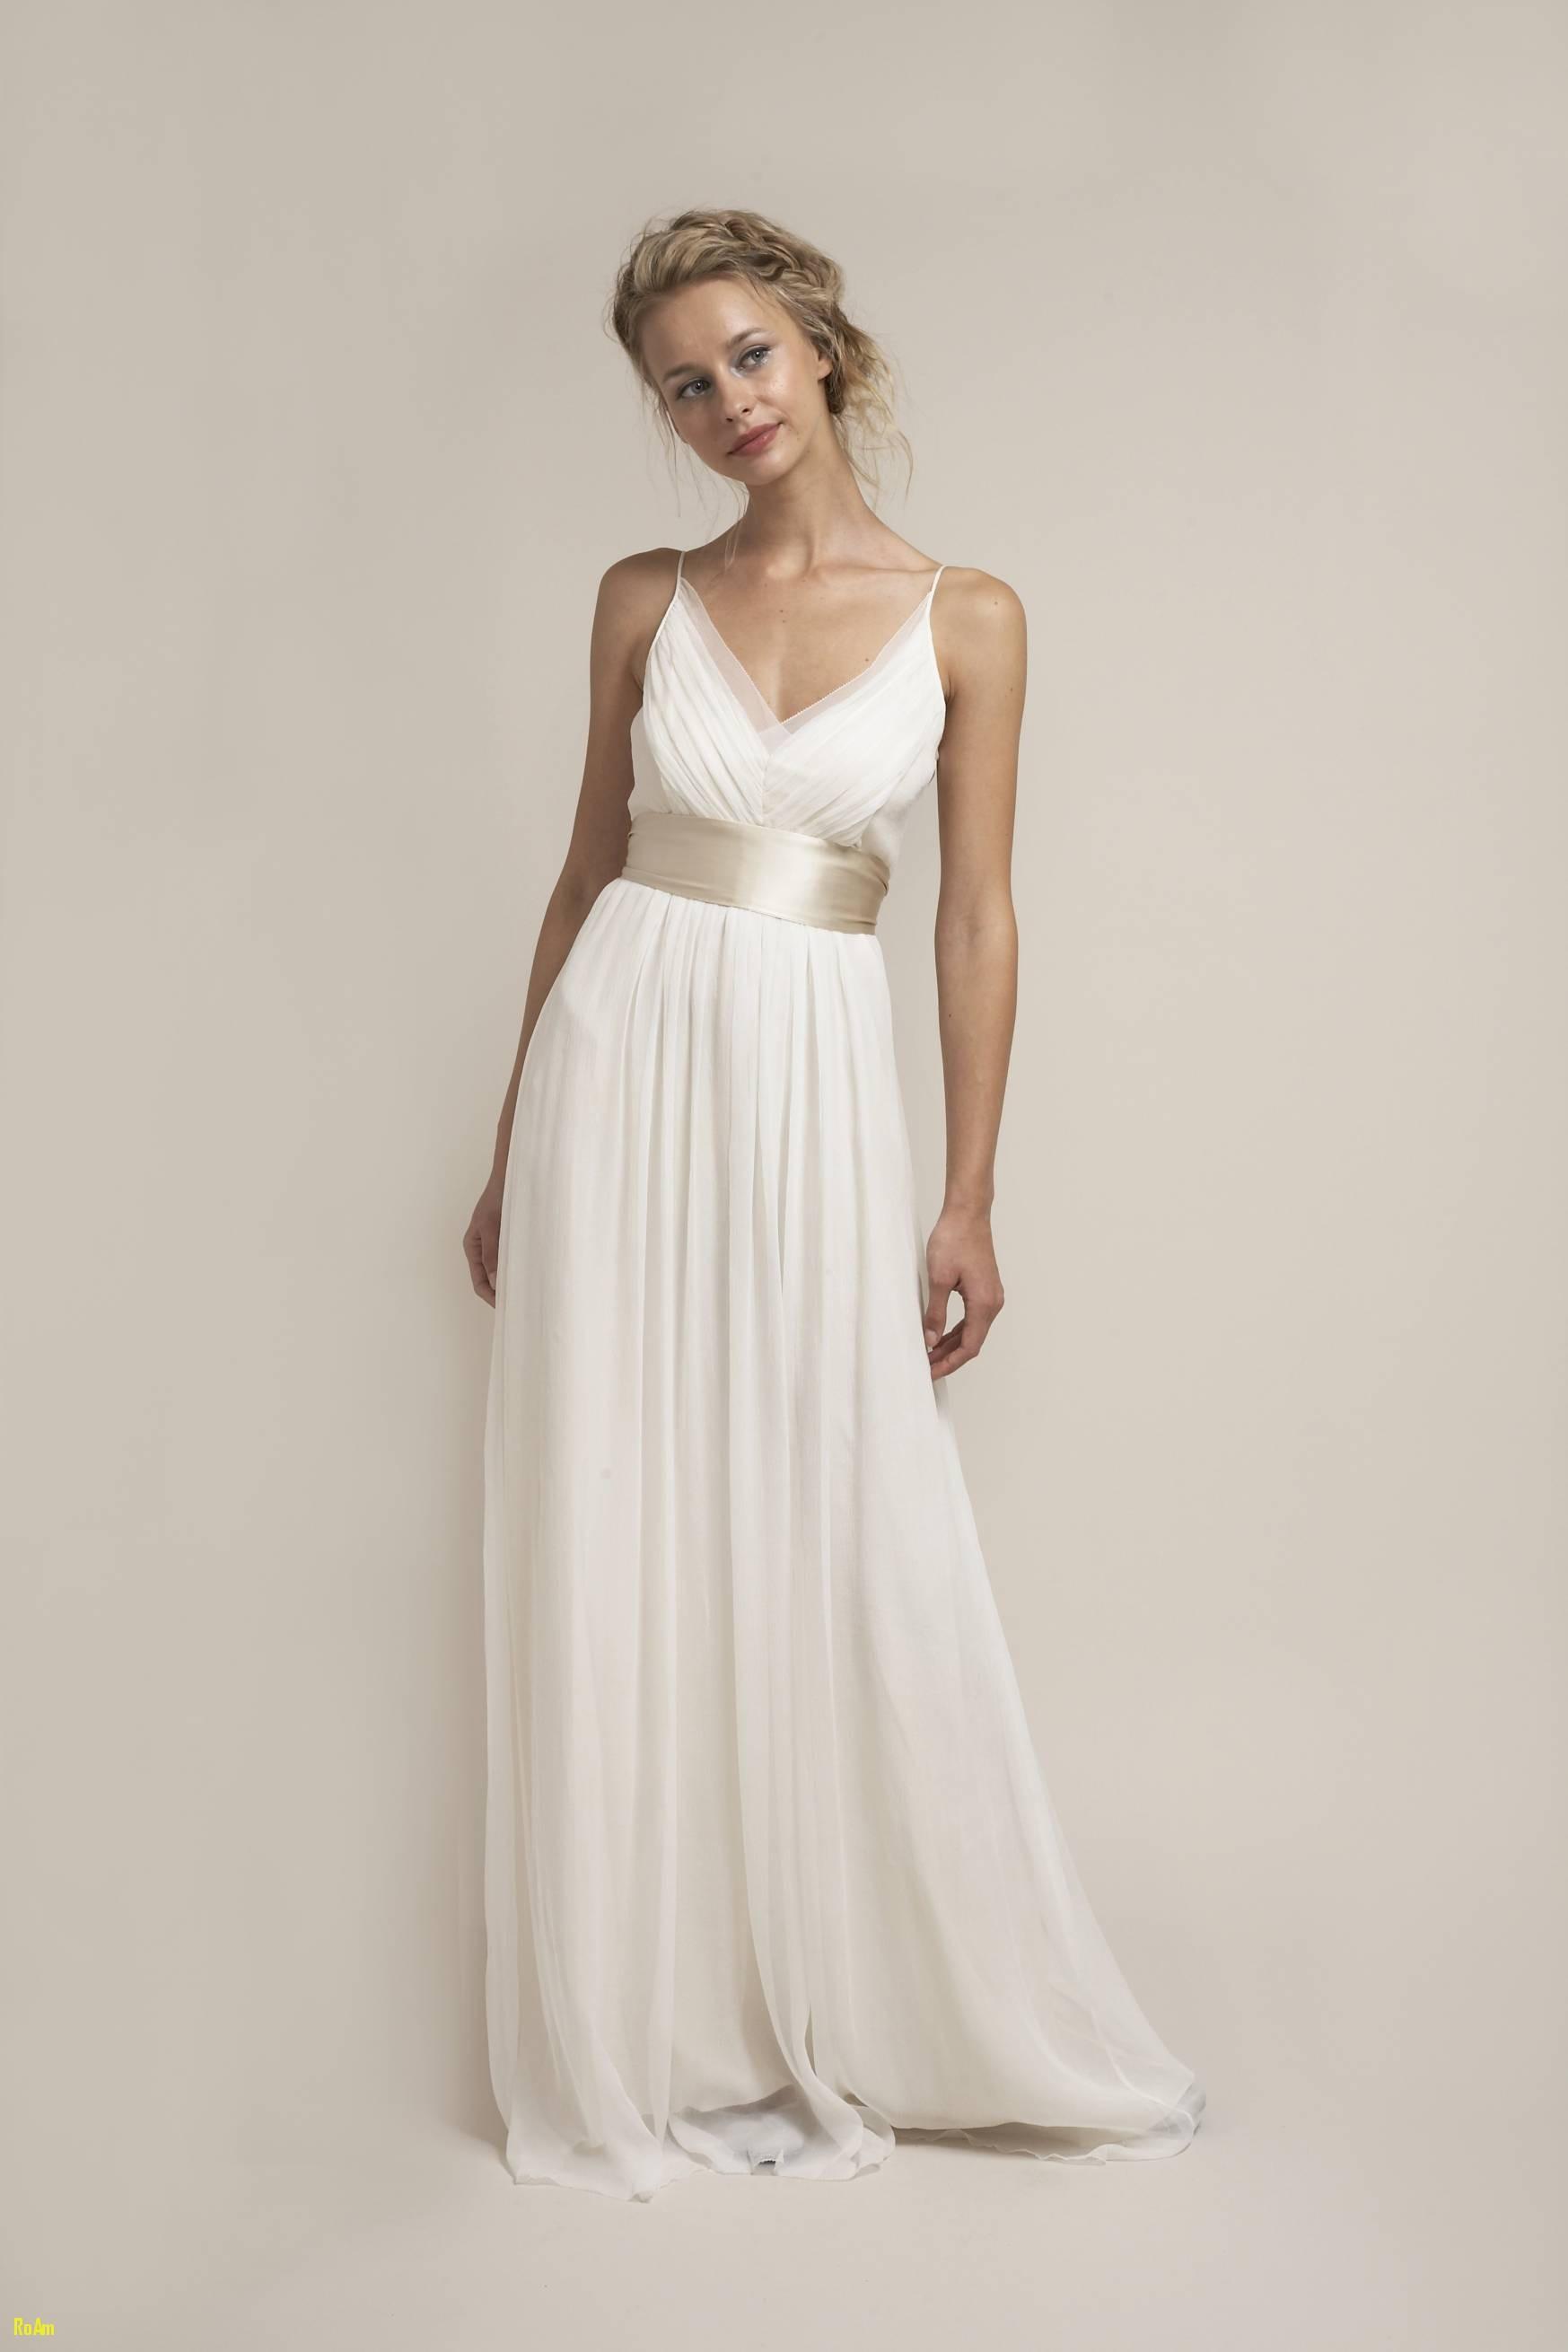 Zalando Hochzeitskleid  Zalando Hochzeitskleid dacostaweb